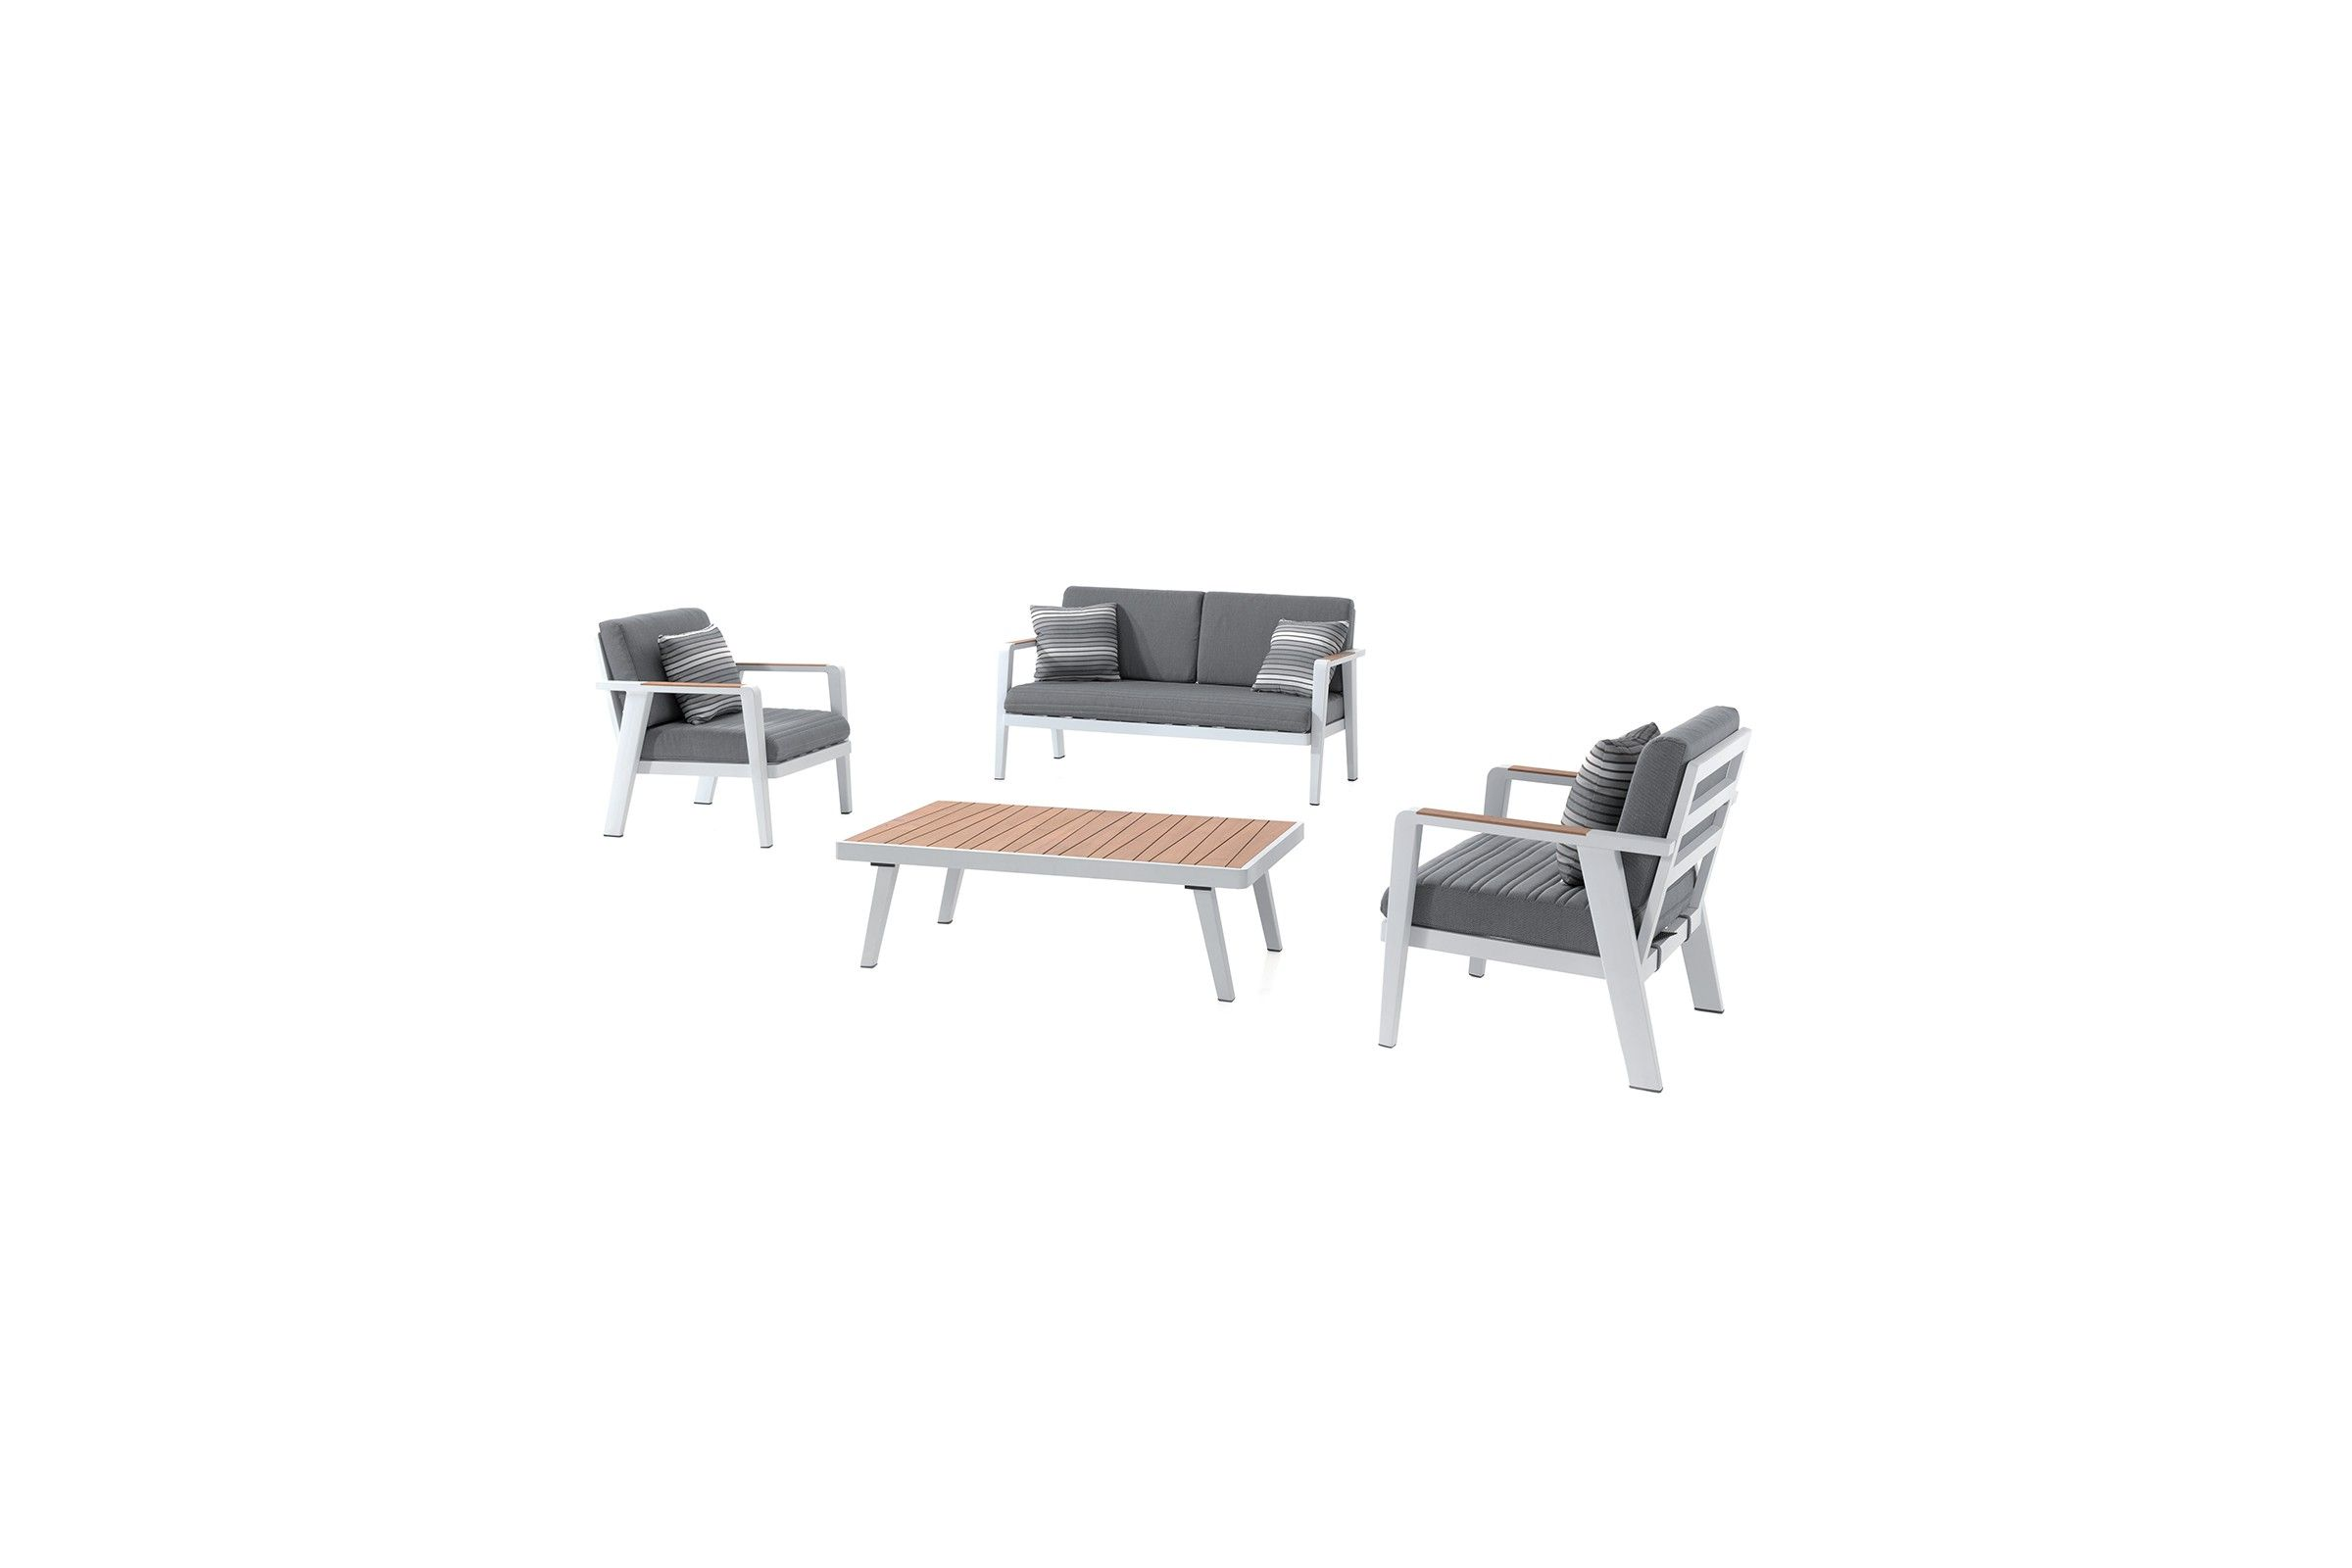 salon de jardin teck alu et coussins d perlant guadeloupe. Black Bedroom Furniture Sets. Home Design Ideas